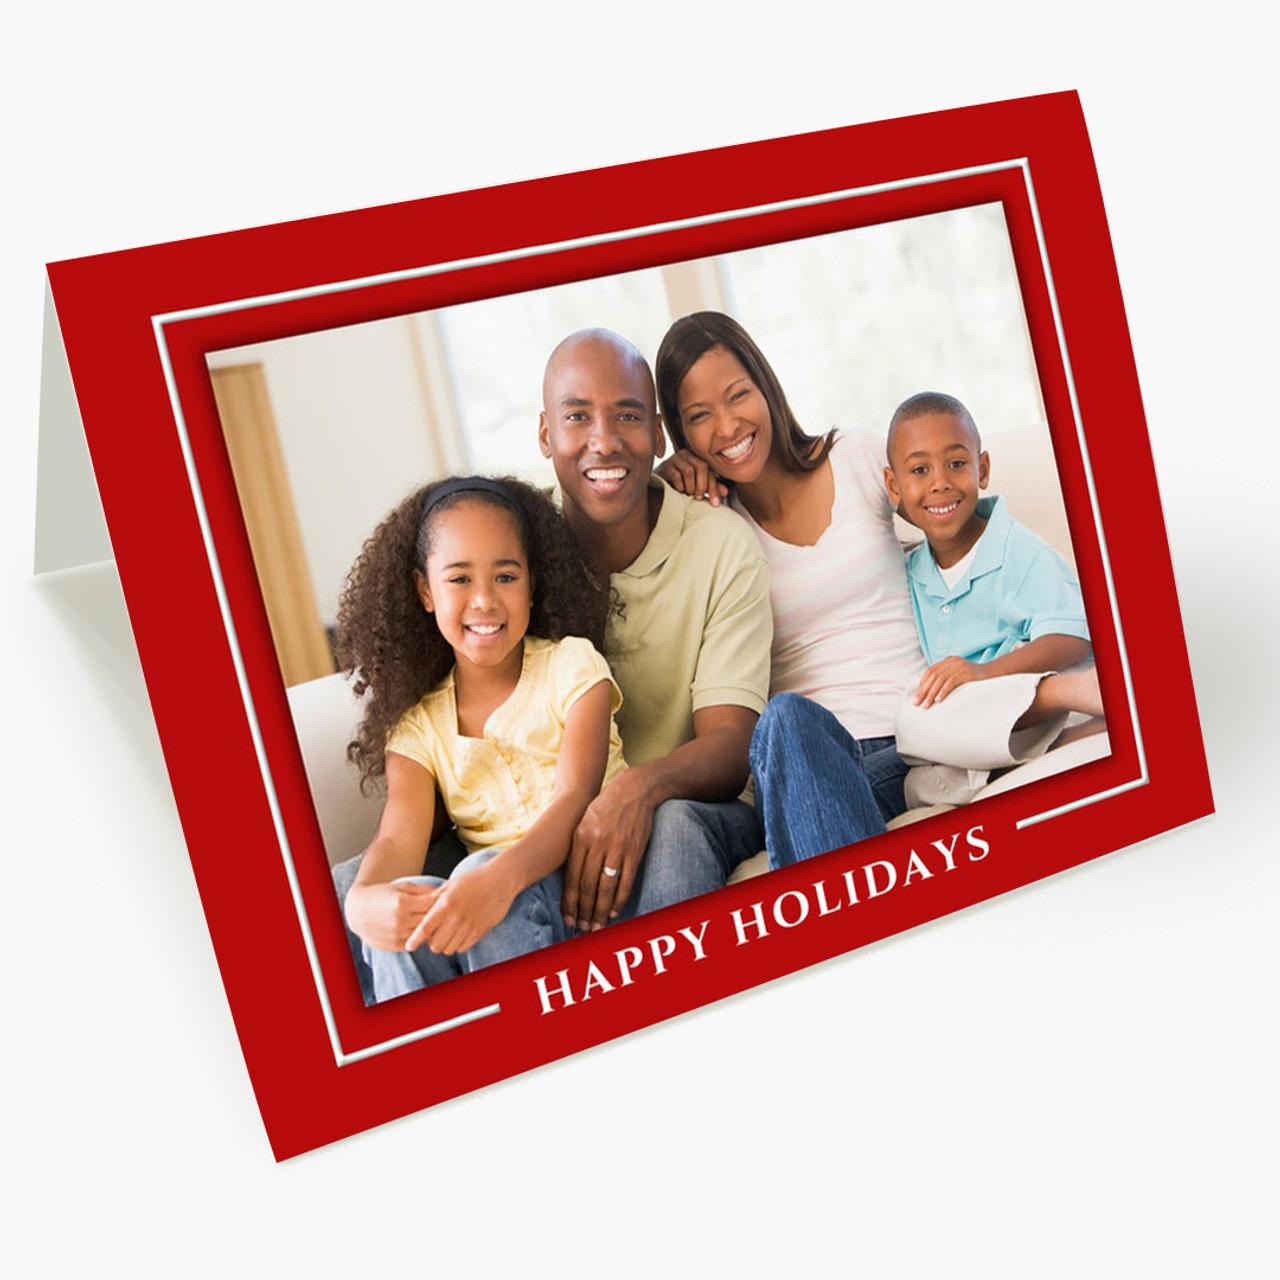 Red Border Horizontal - Matte Finish Christmas Card